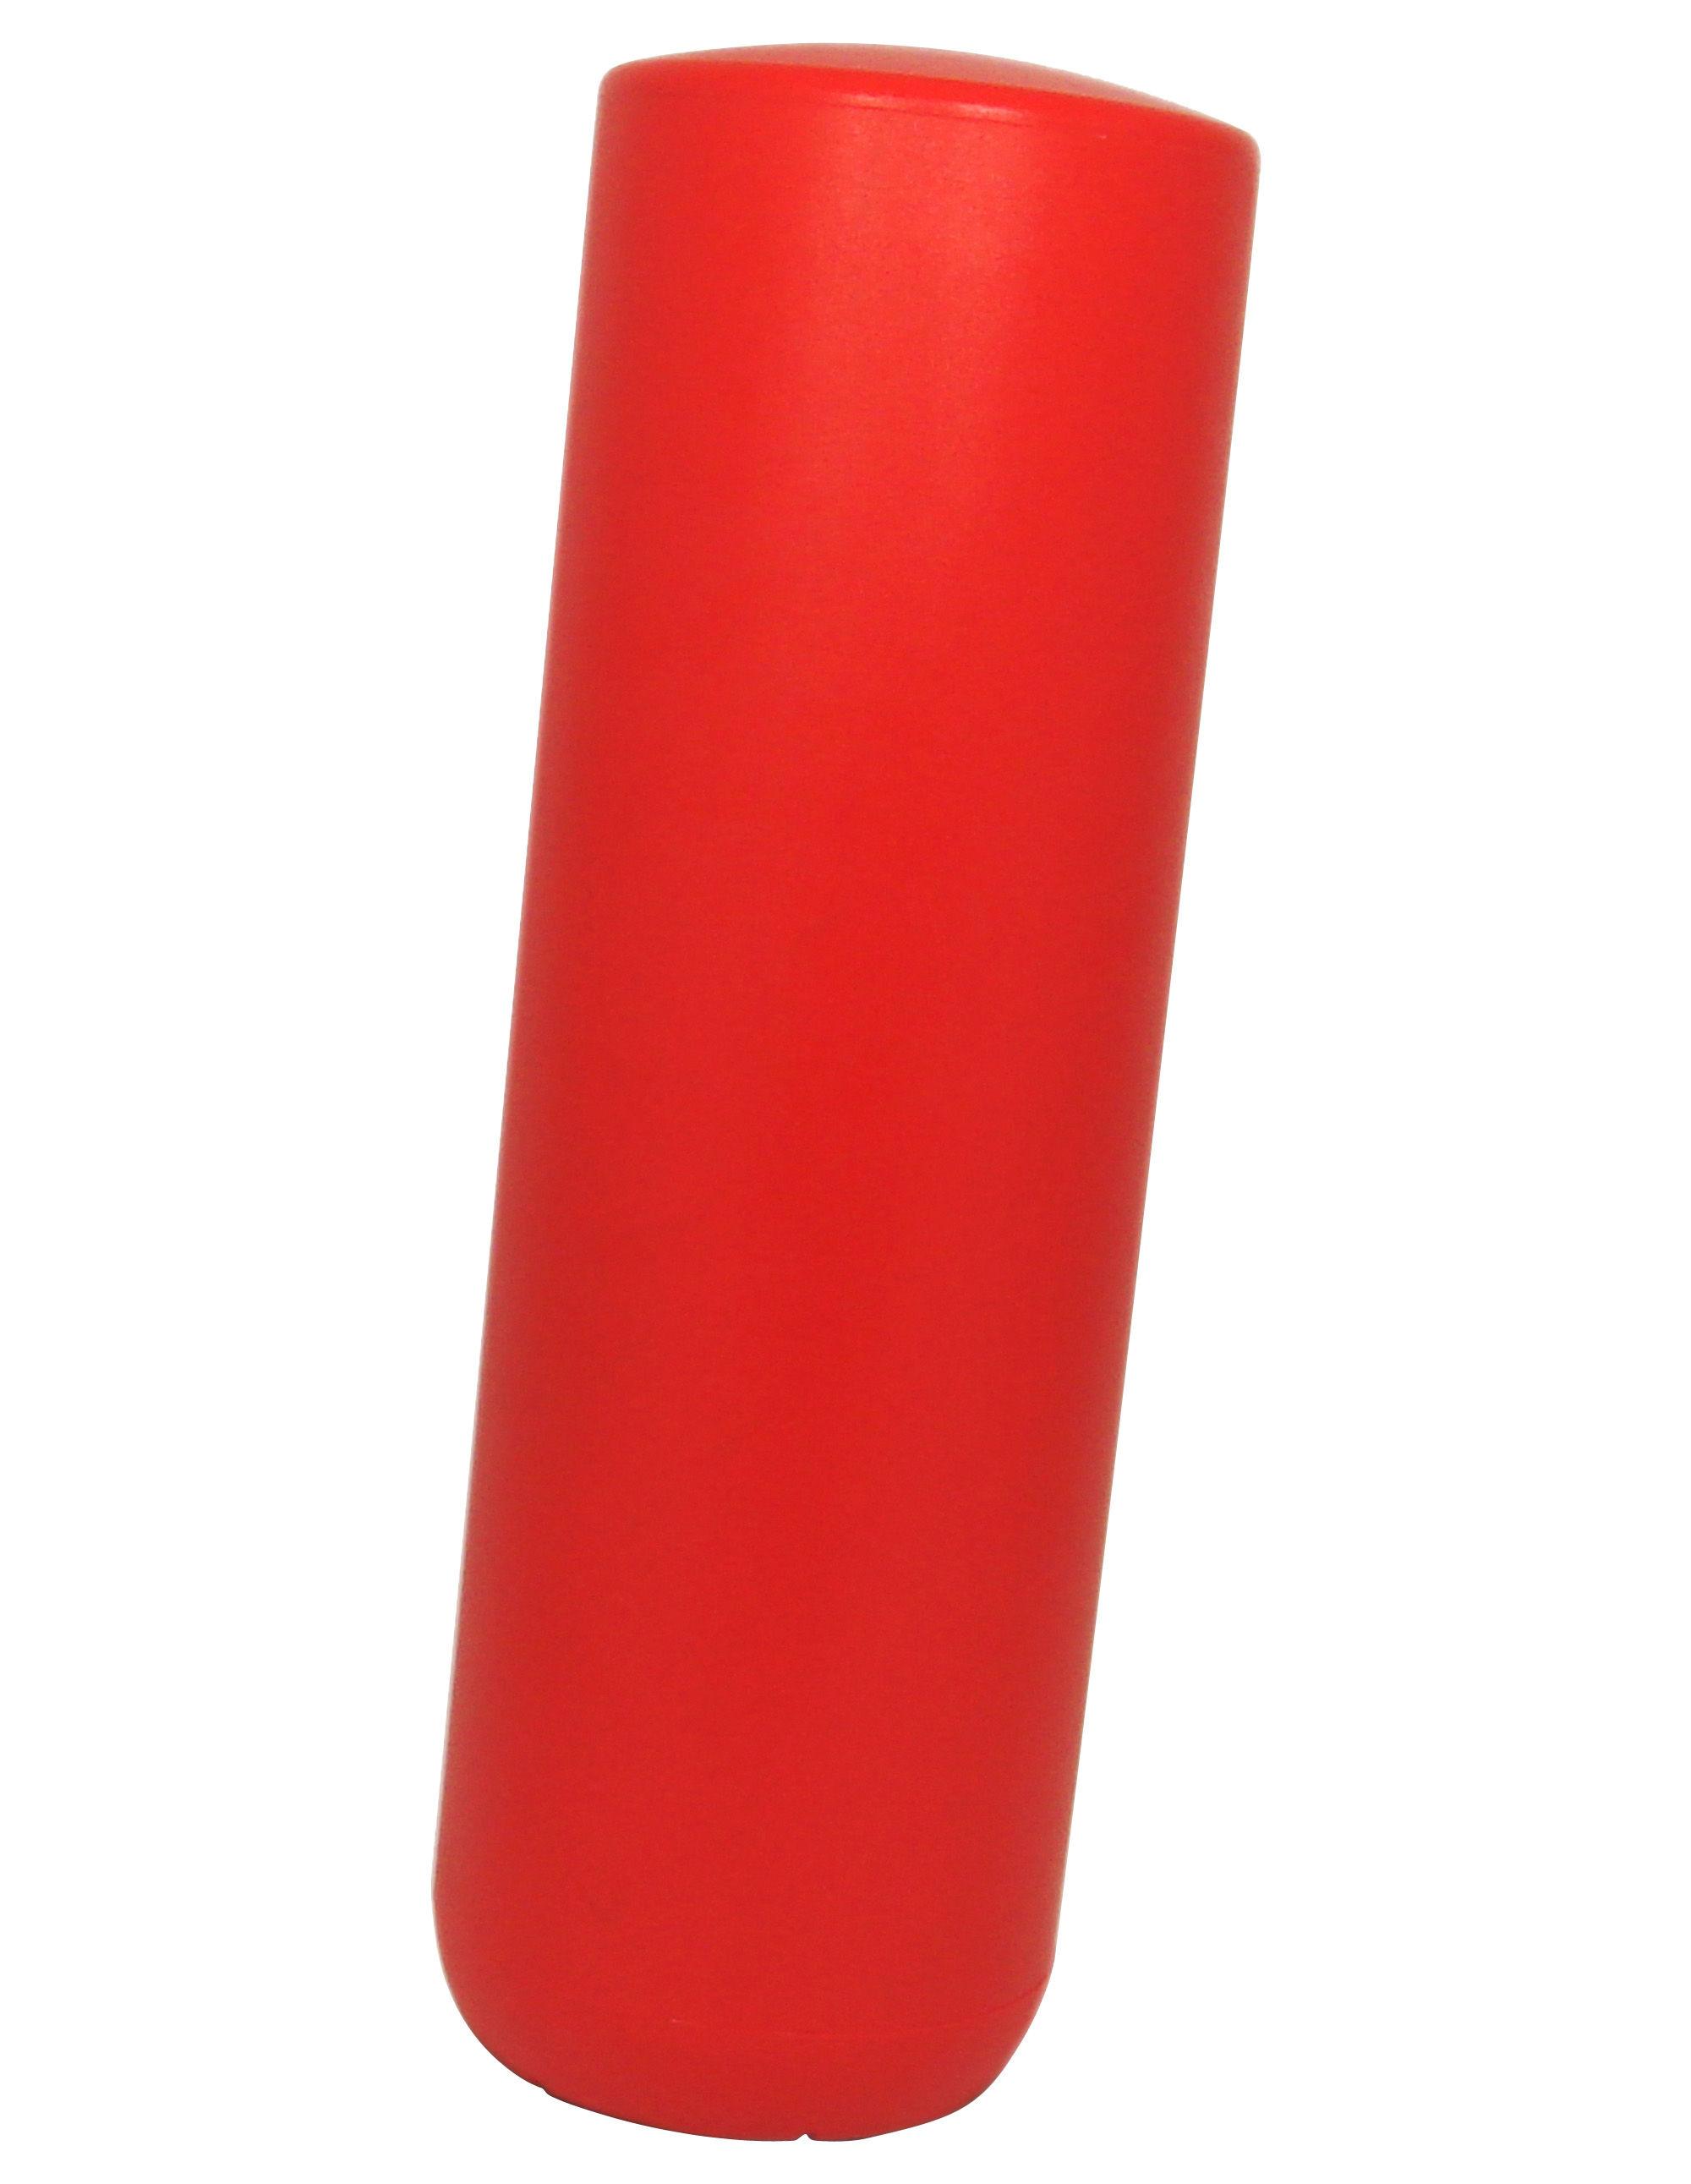 Möbel - Barhocker - Sway Barhocker / H 66,5 cm - aus Kunststoff - Thelermont Hupton - Rot - Polyäthylen